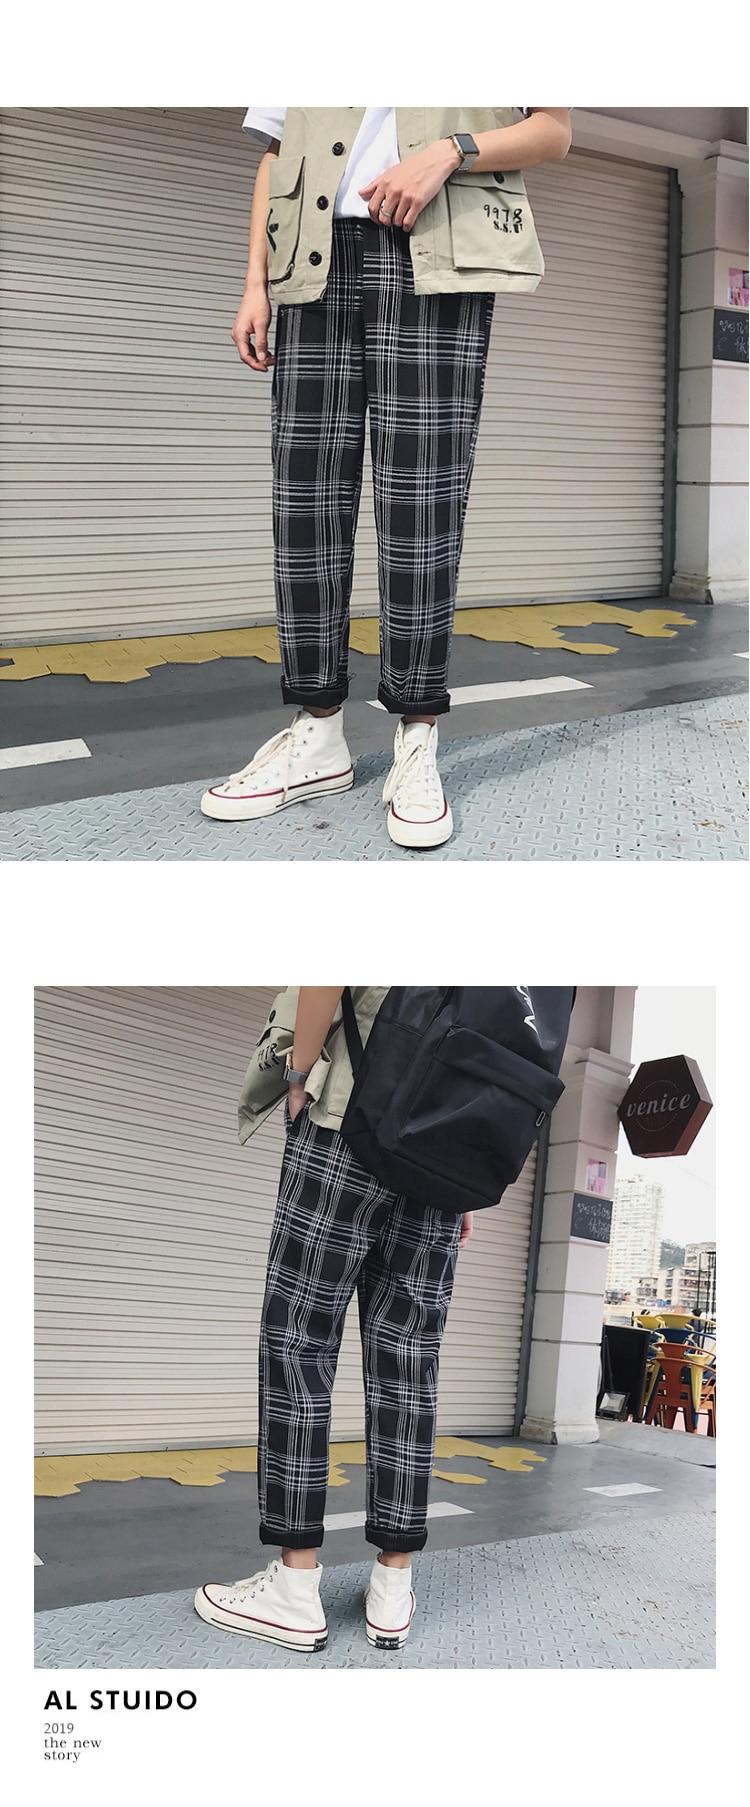 HTB1mO1qbsrrK1RjSspaq6AREXXag LAPPSTER Streetwear Yellow Plaid Pants Men Joggers 2019 Man Casual Straight Harem Pants Men Korean Hip Hop Track Pants Plus Size